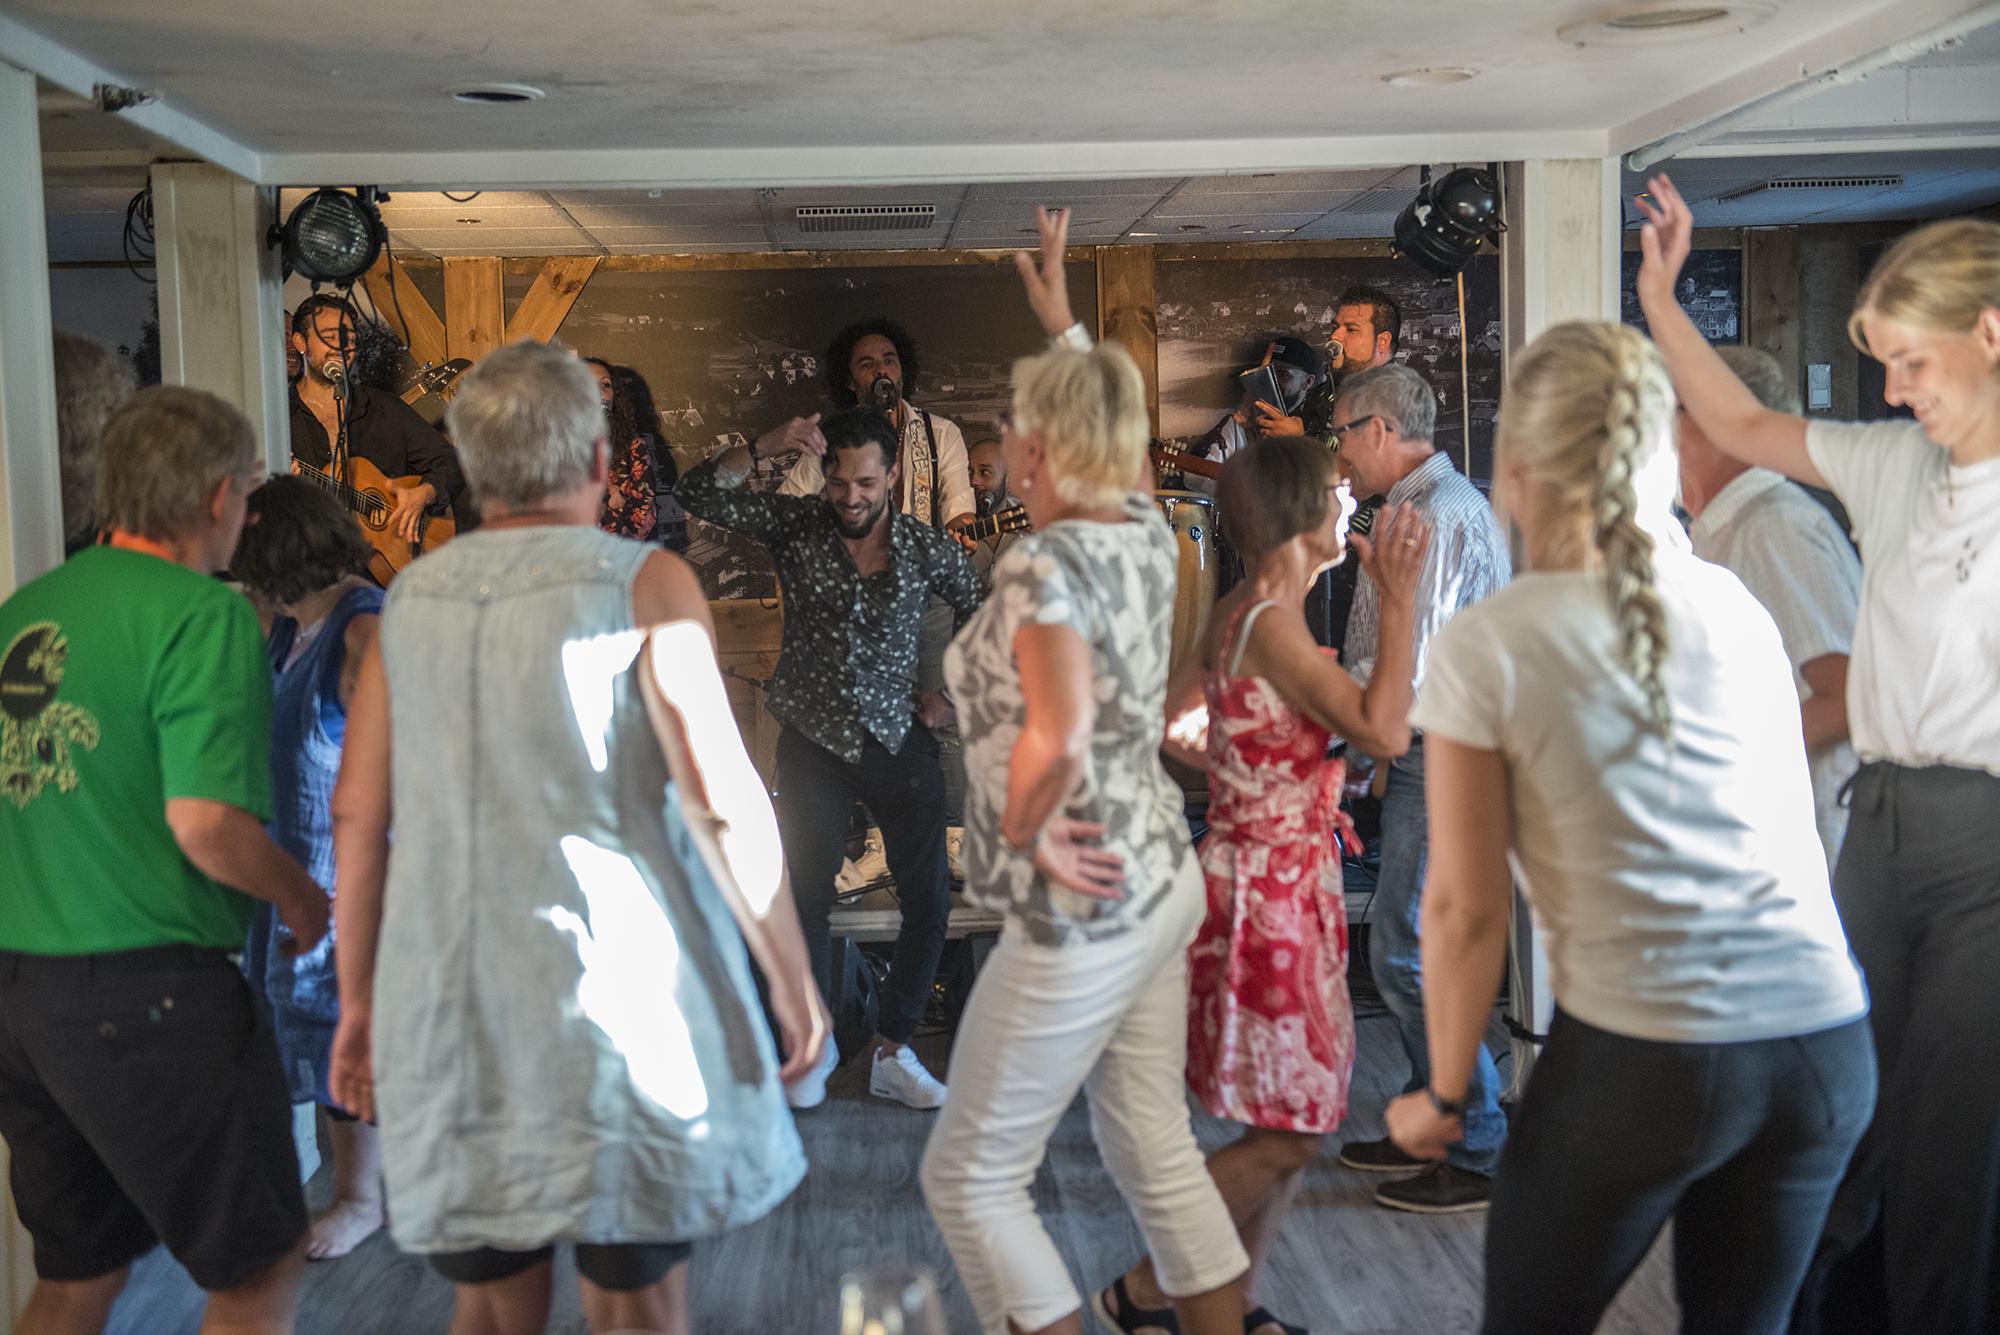 Enrique Serviole får folk med seg i dansen. (Foto: Marianne Lystrup)